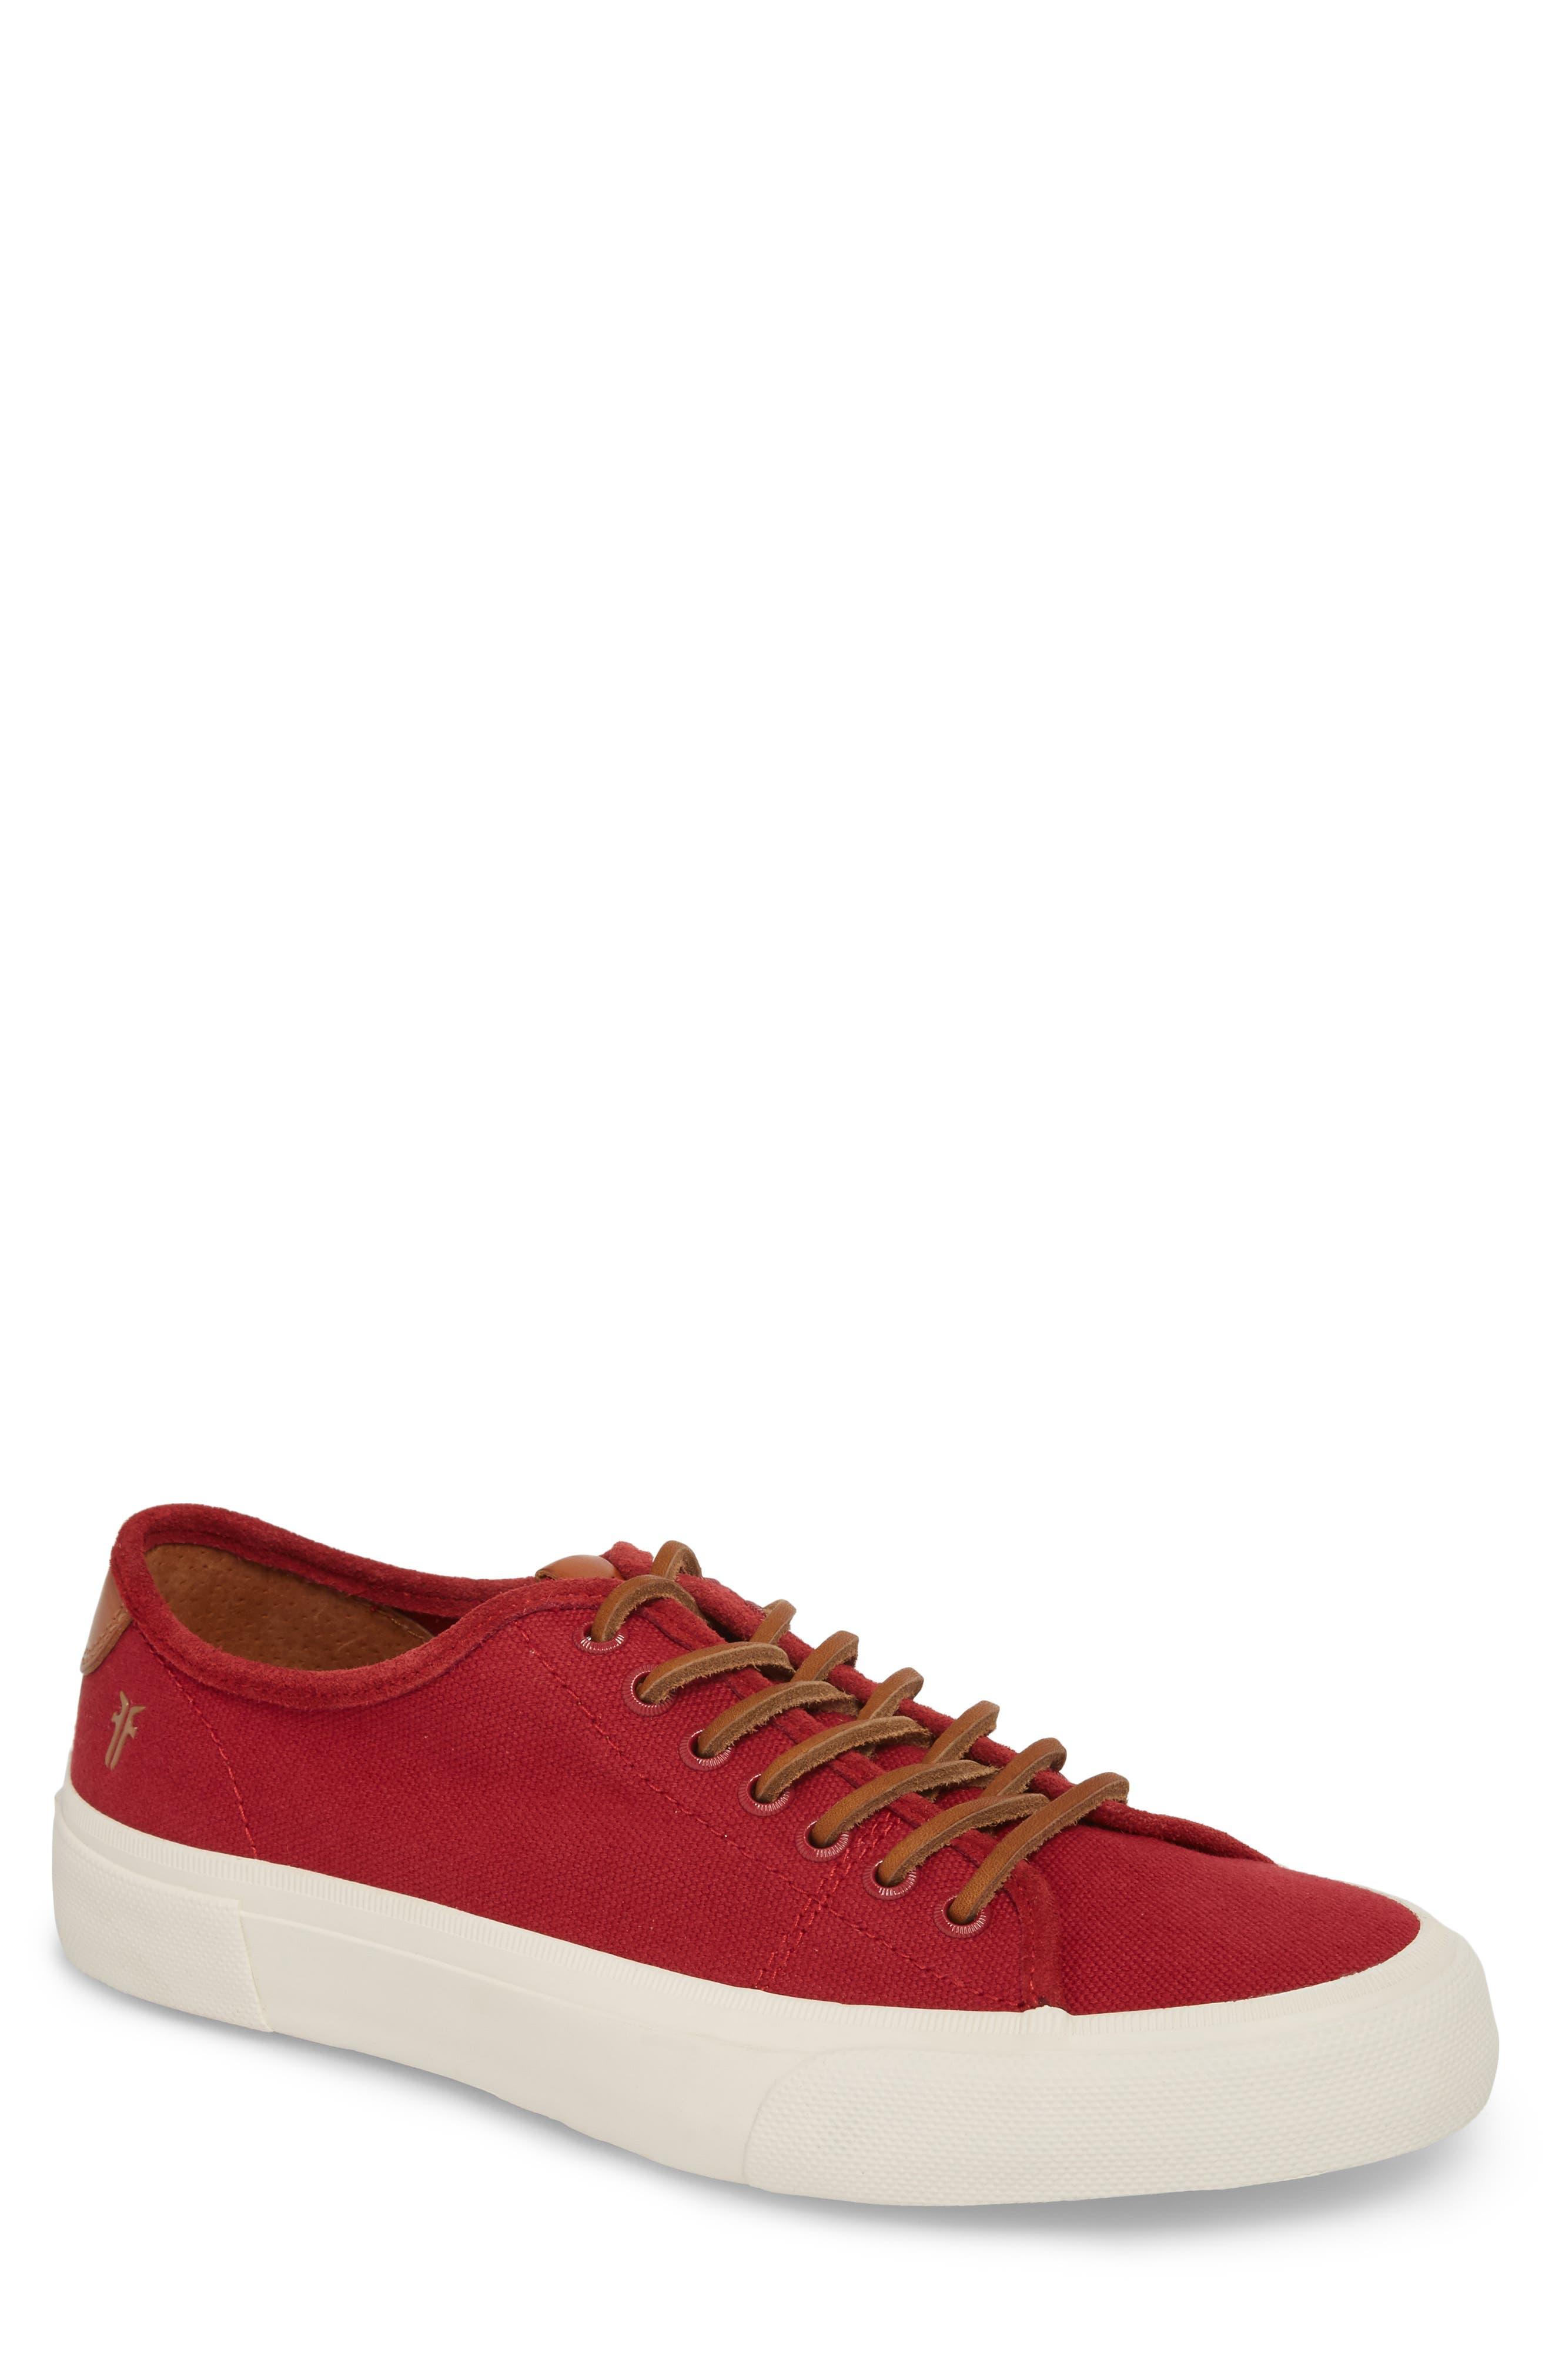 Alternate Image 1 Selected - Frye Ludlow Low Top Sneaker (Men)